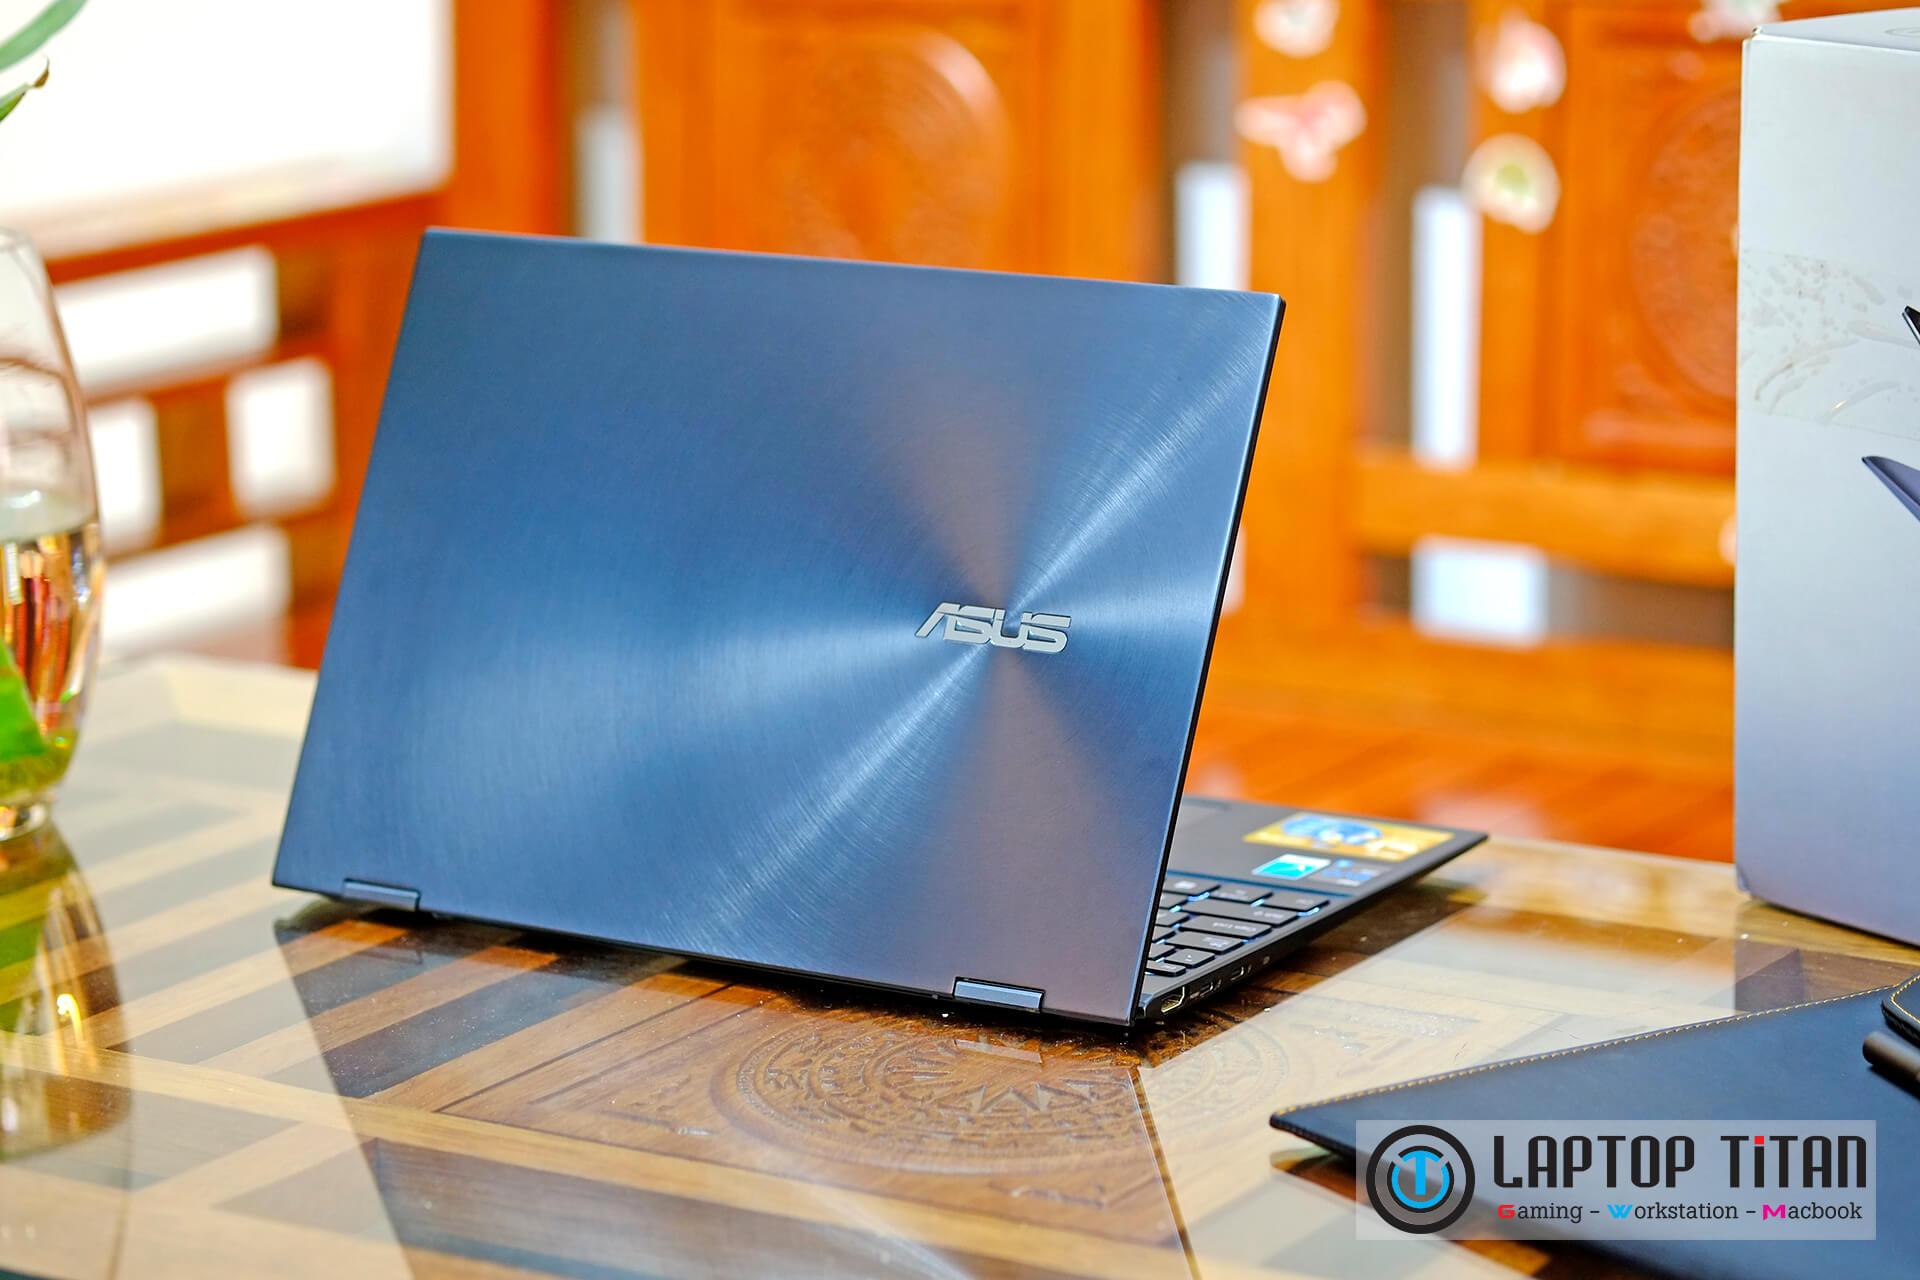 Asus Zenbook Flip UX363EA-HP130T-007